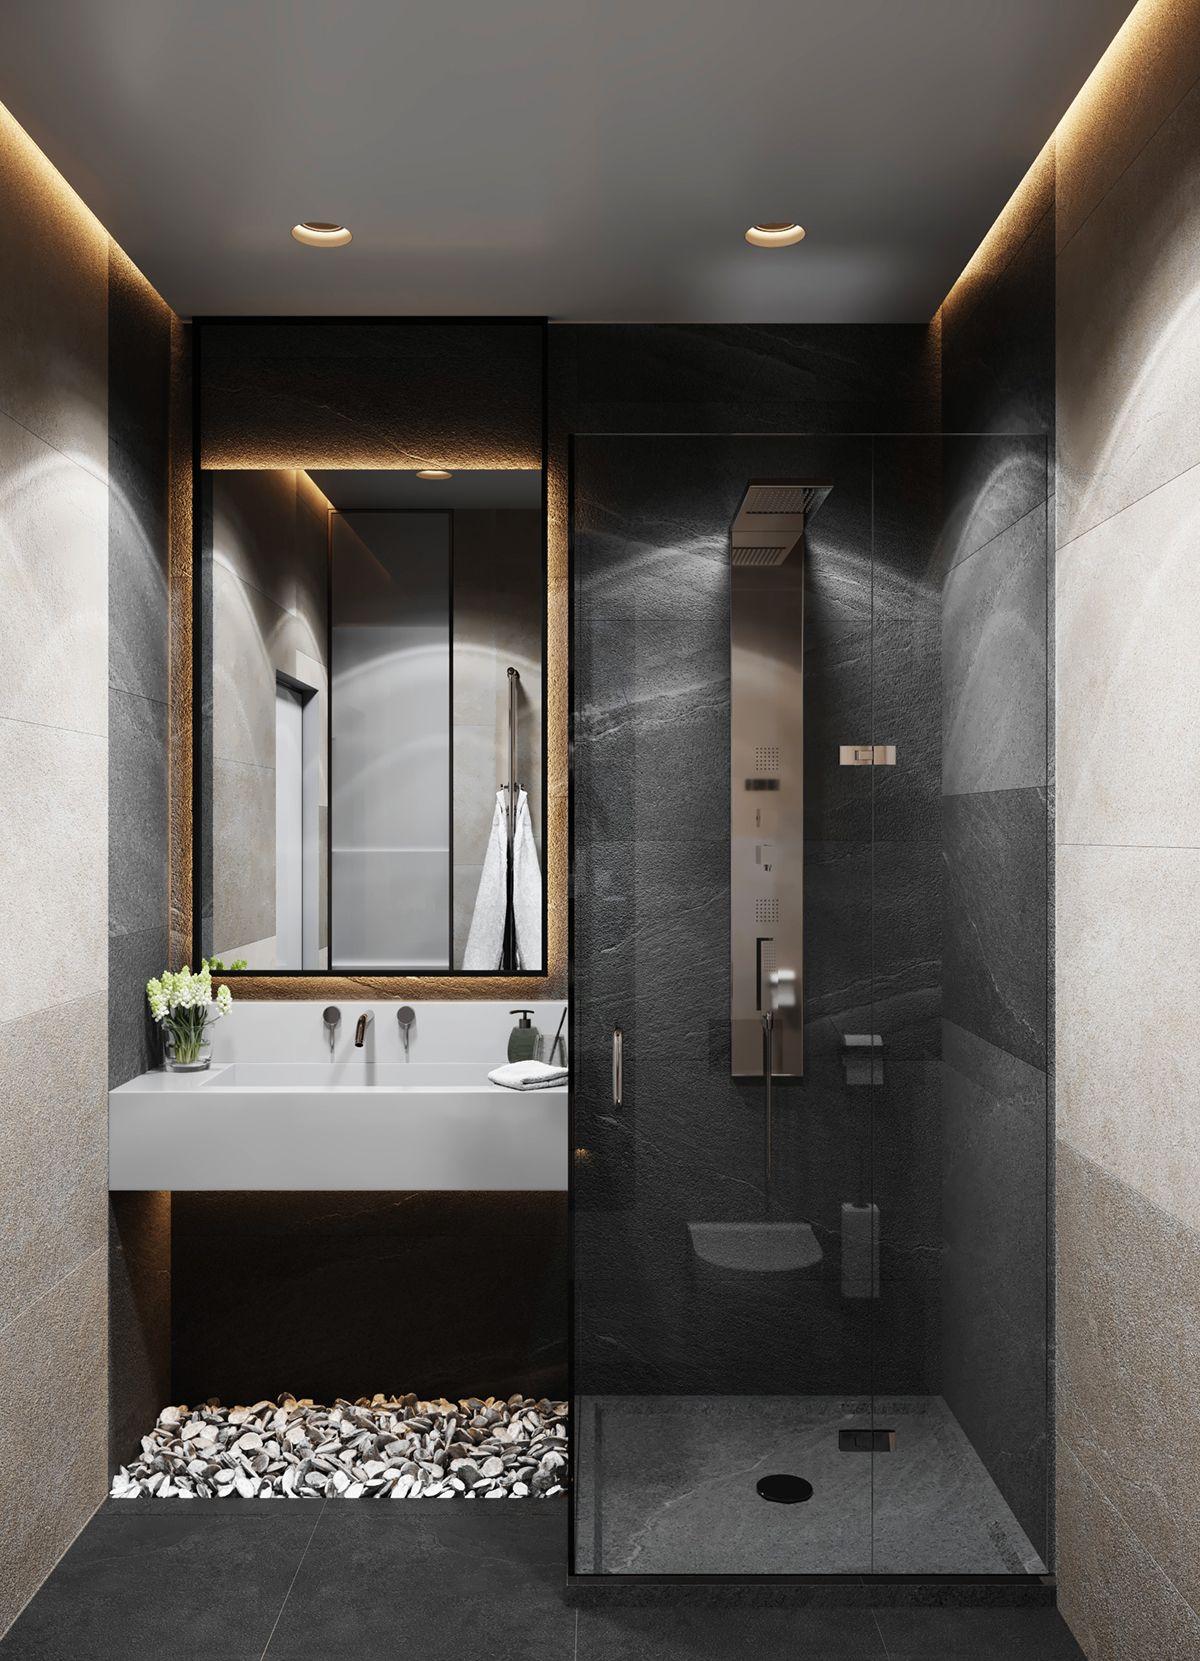 Dubrovka Master Bedroom Master Bathroom On Behance Bathroom Design Luxury Master Bedroom Bathroom Bathroom Design Small